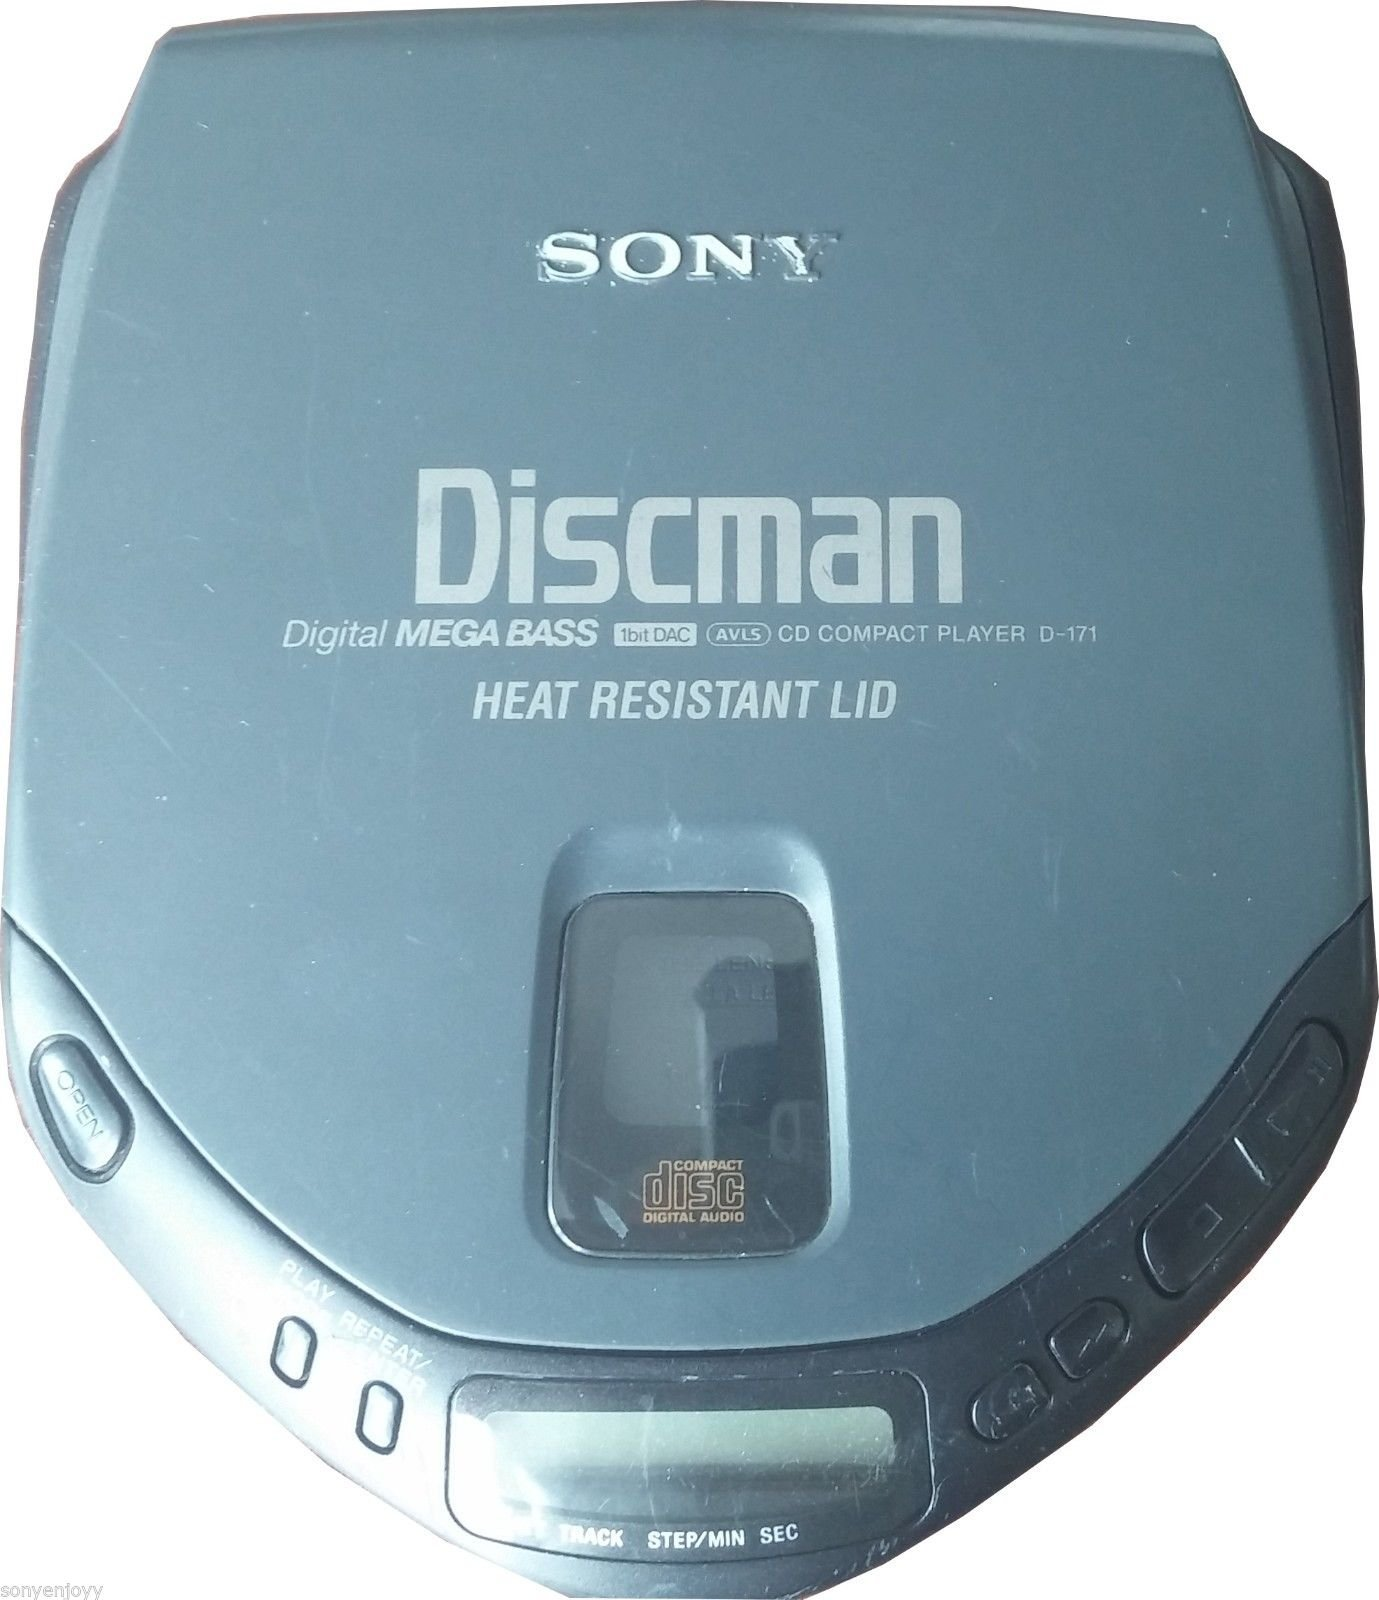 SONY Discman D-171 Portable Programmable CD Player with Mega Bass 1 Bit DAC